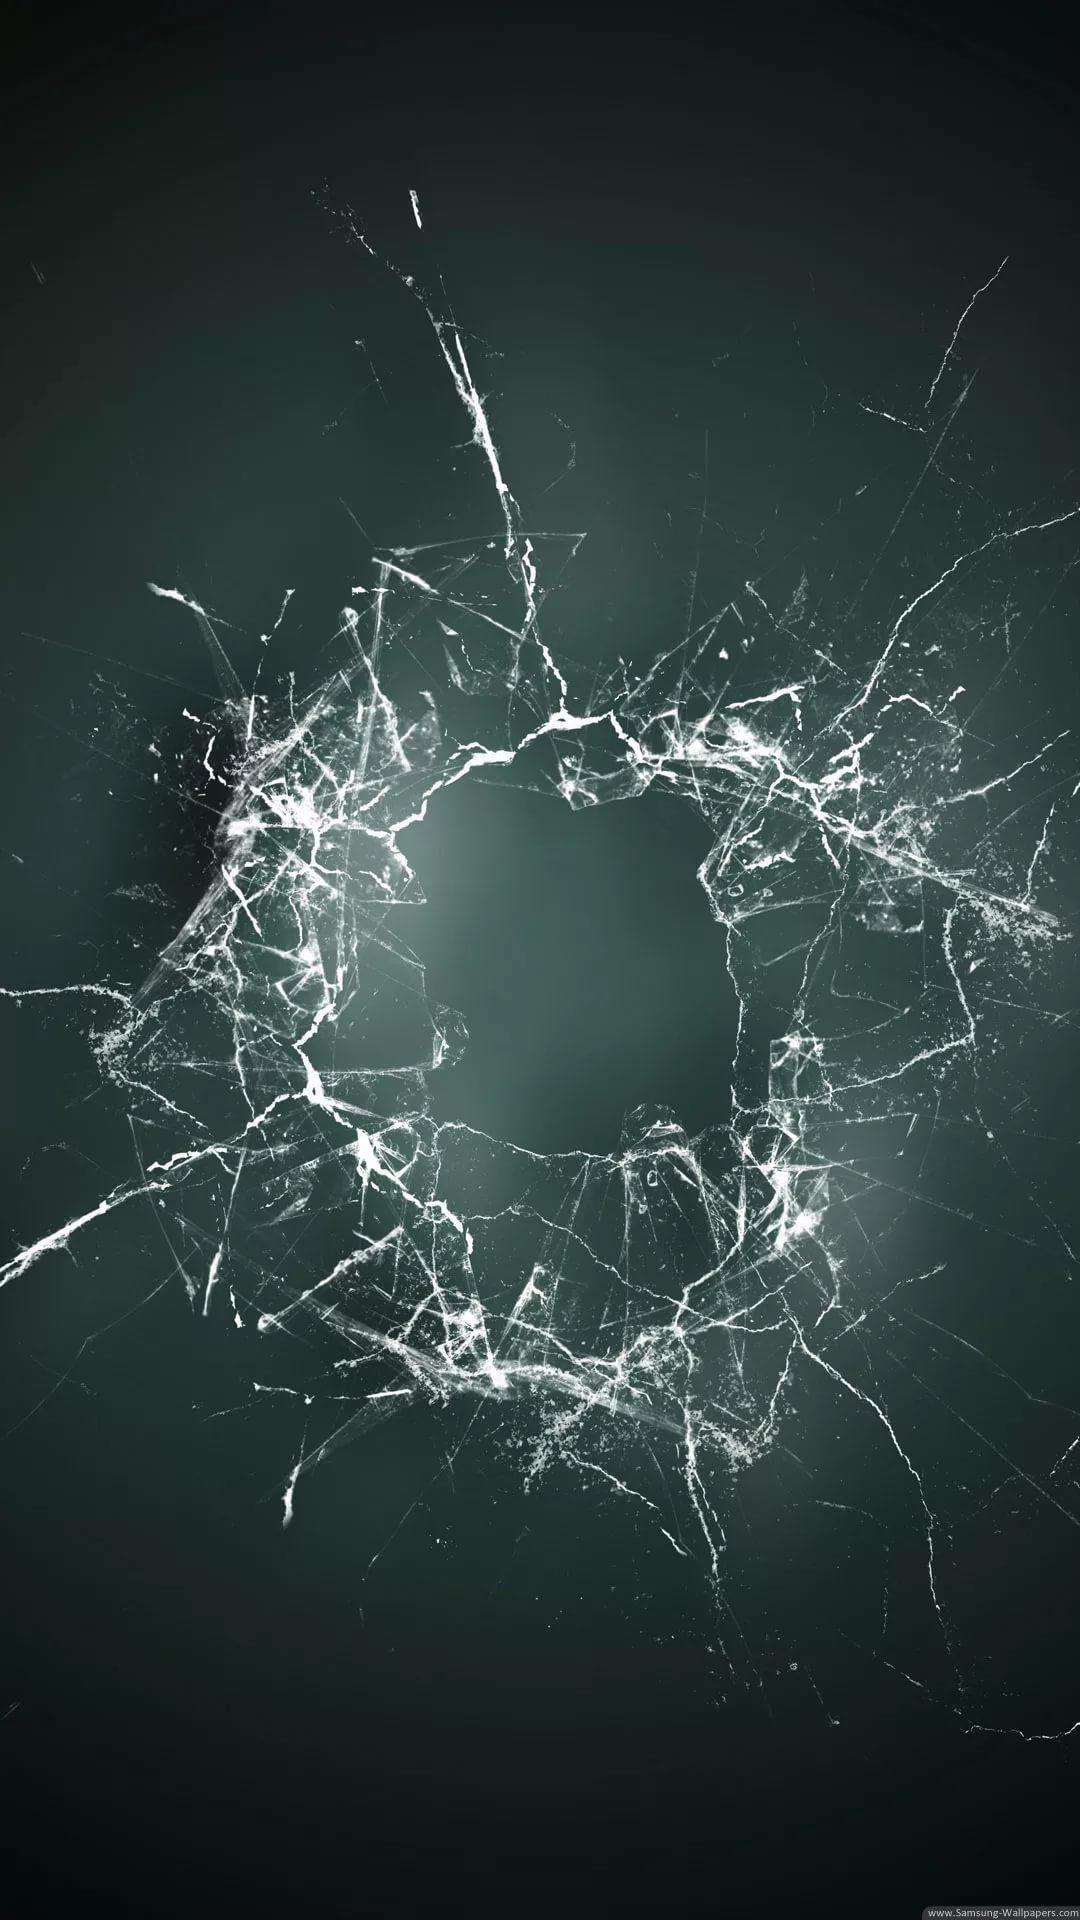 Cracked Phone iPhone 5 wallpaper